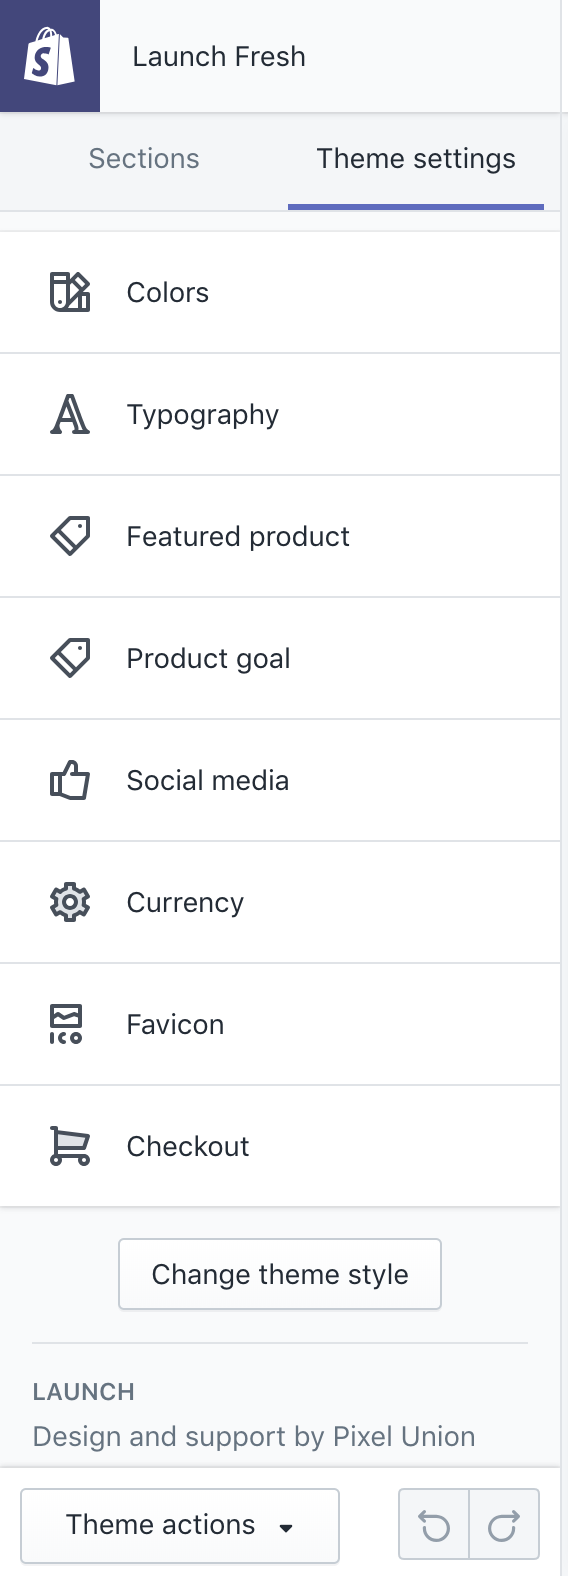 Theme settings in Launch Fresh Demo